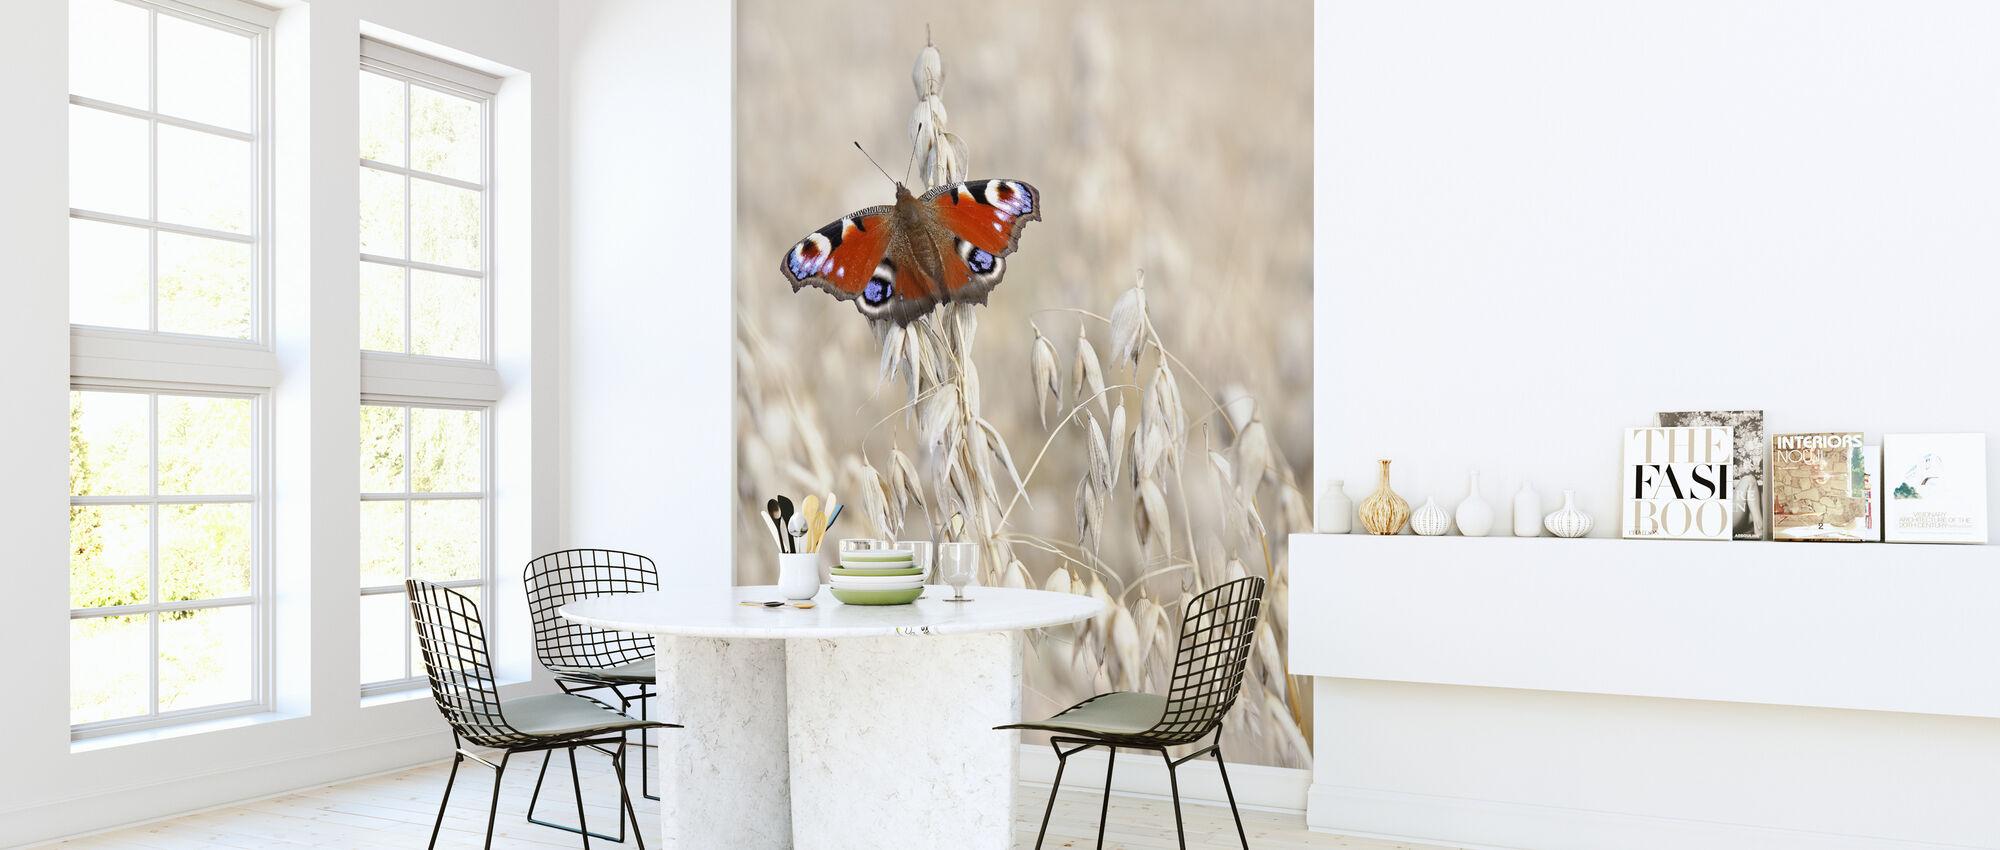 Peacock Butterfly on Oats - Wallpaper - Kitchen